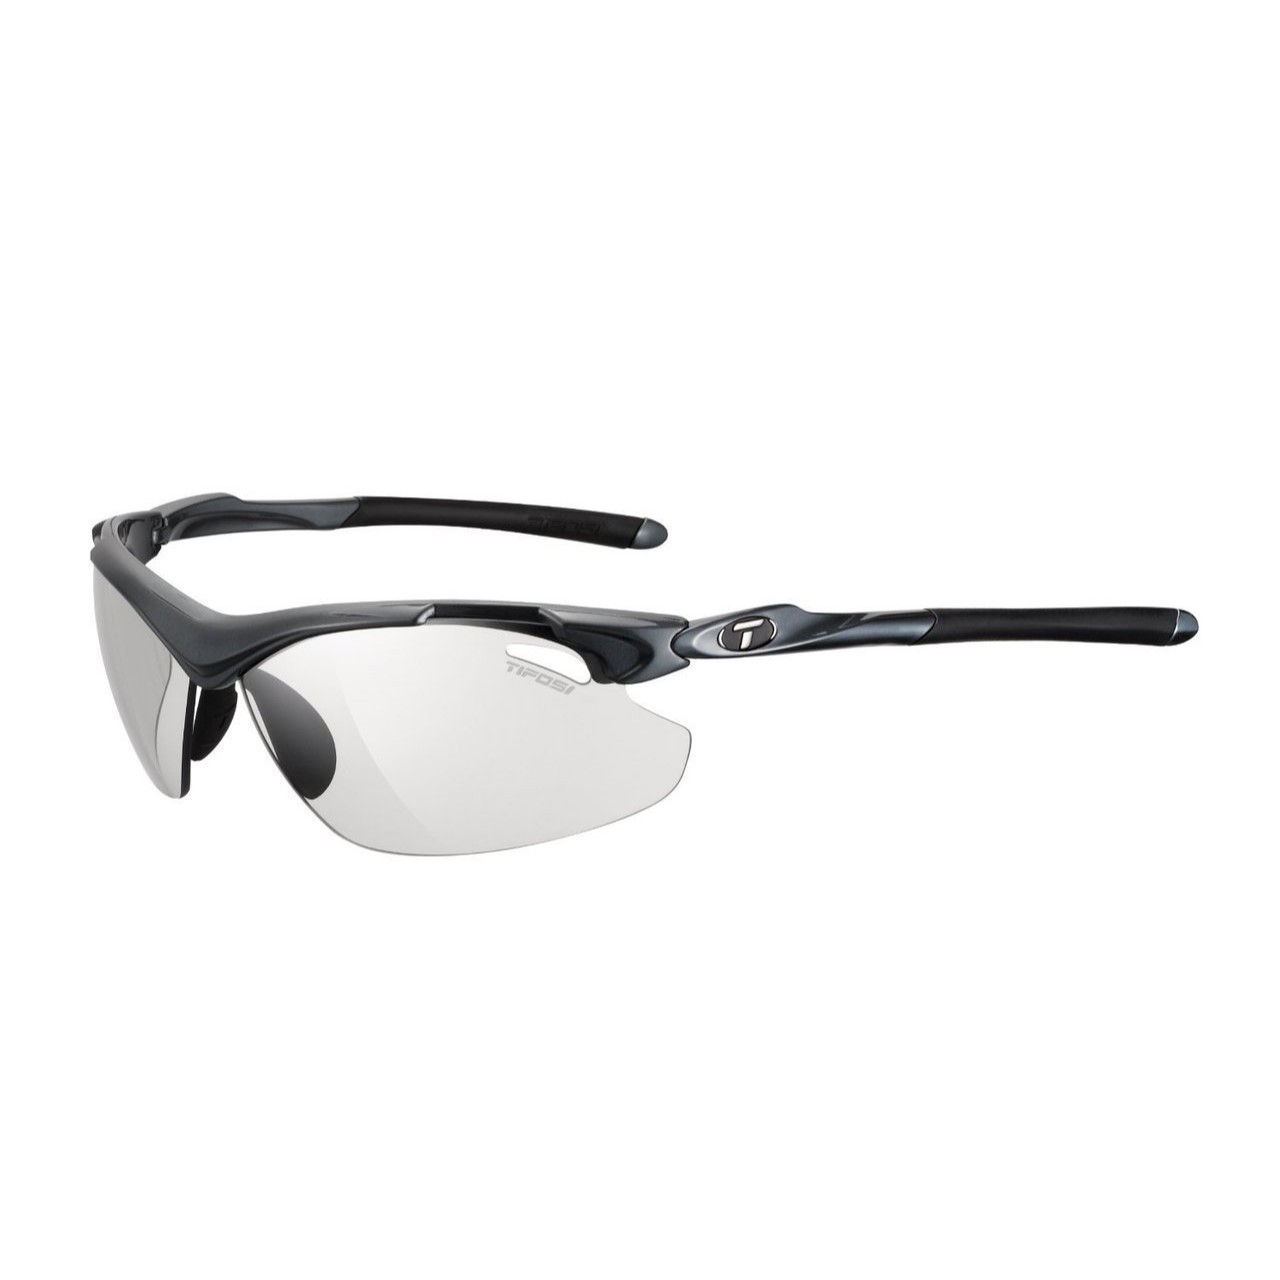 b5ae262ac43 Tifosi Tyrant 2.0 Sunglasses with Light Night Fototec Lens - 2019 ...